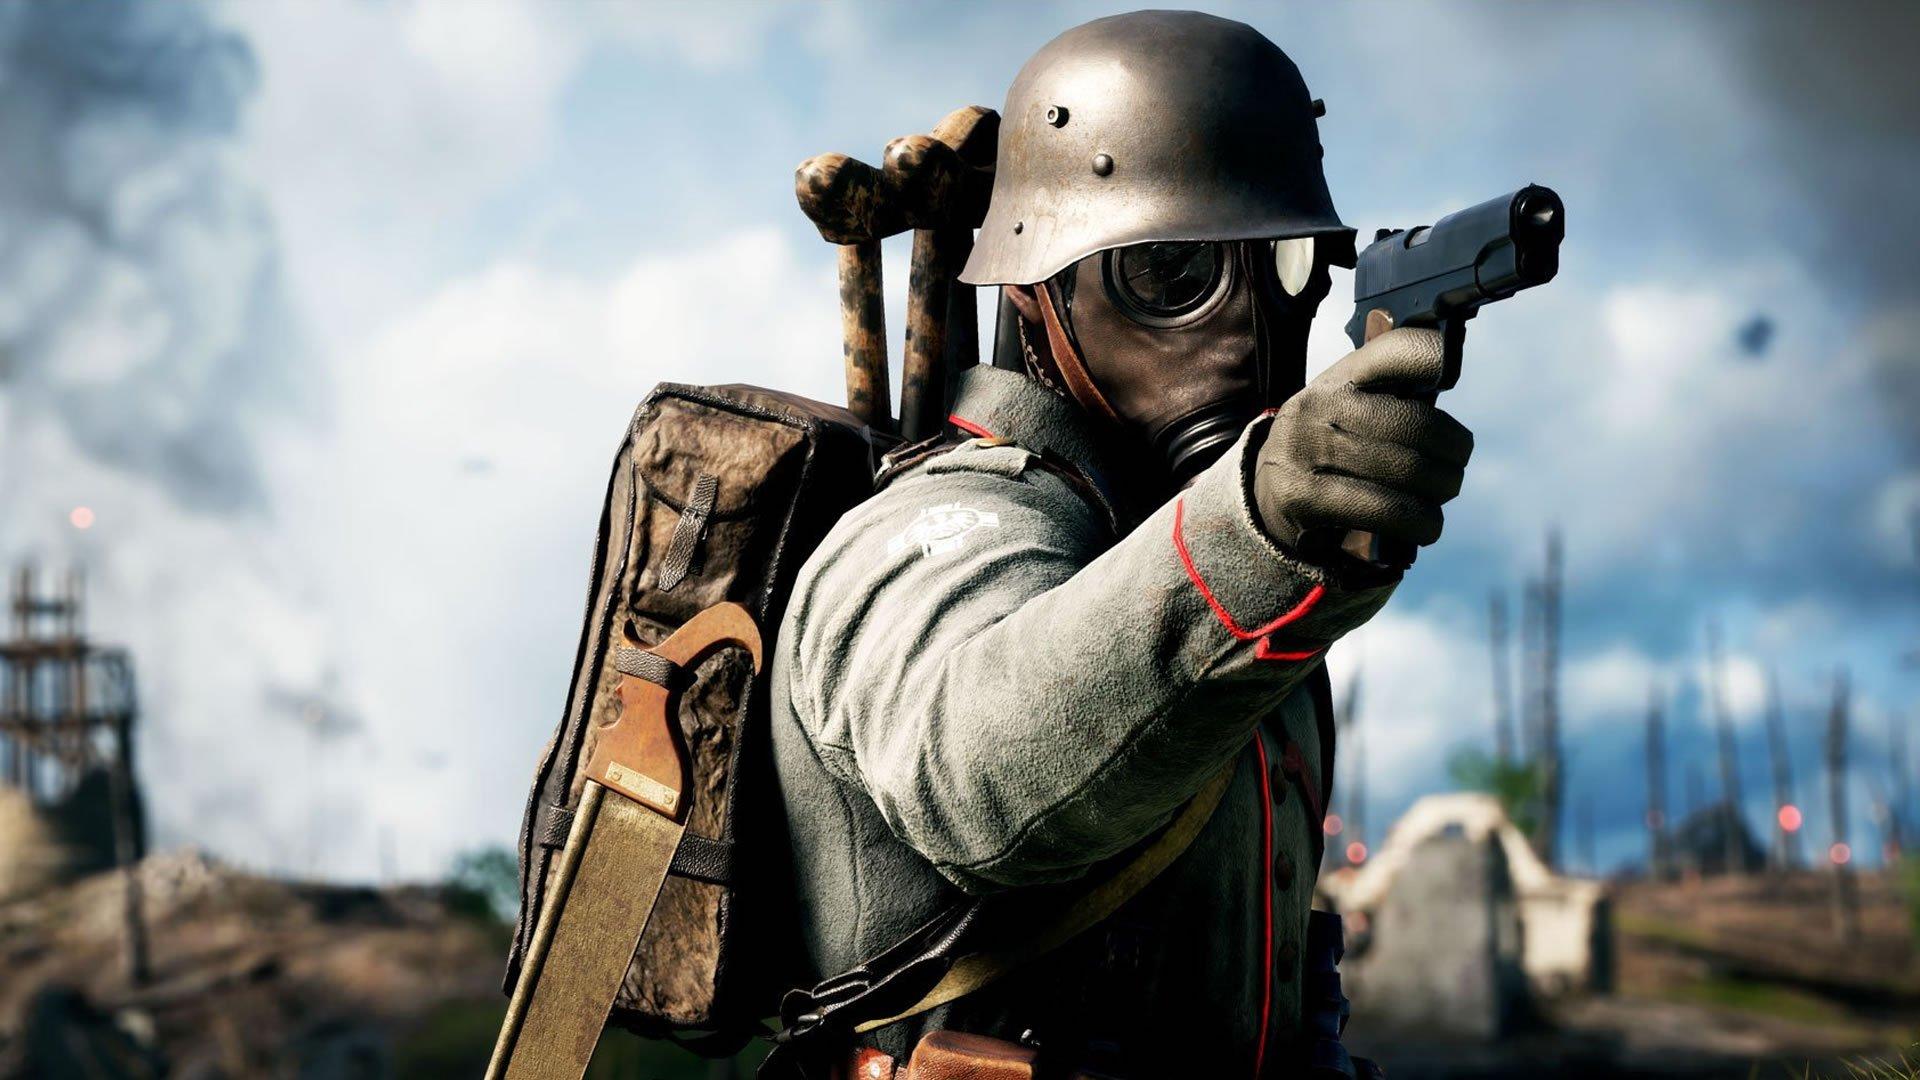 battlefield 3 asking for activation key